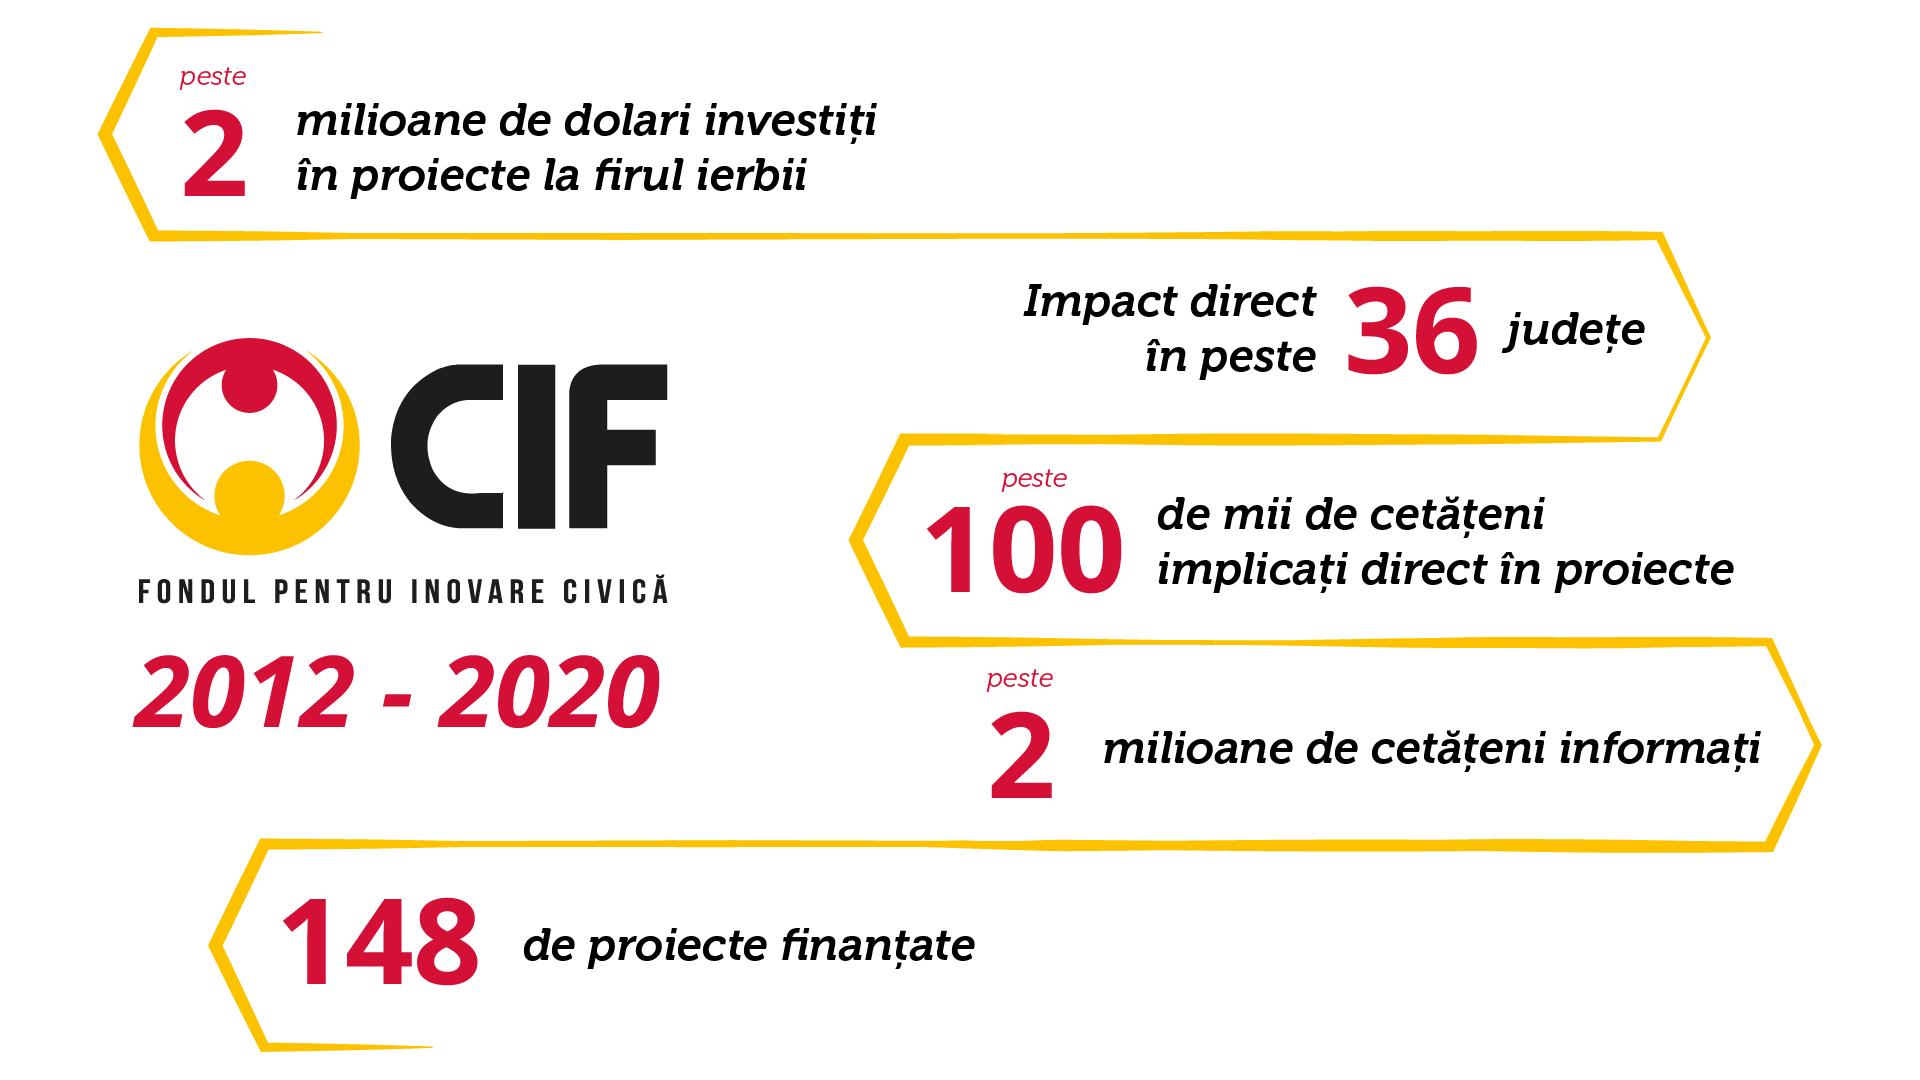 infografic-CIF-01